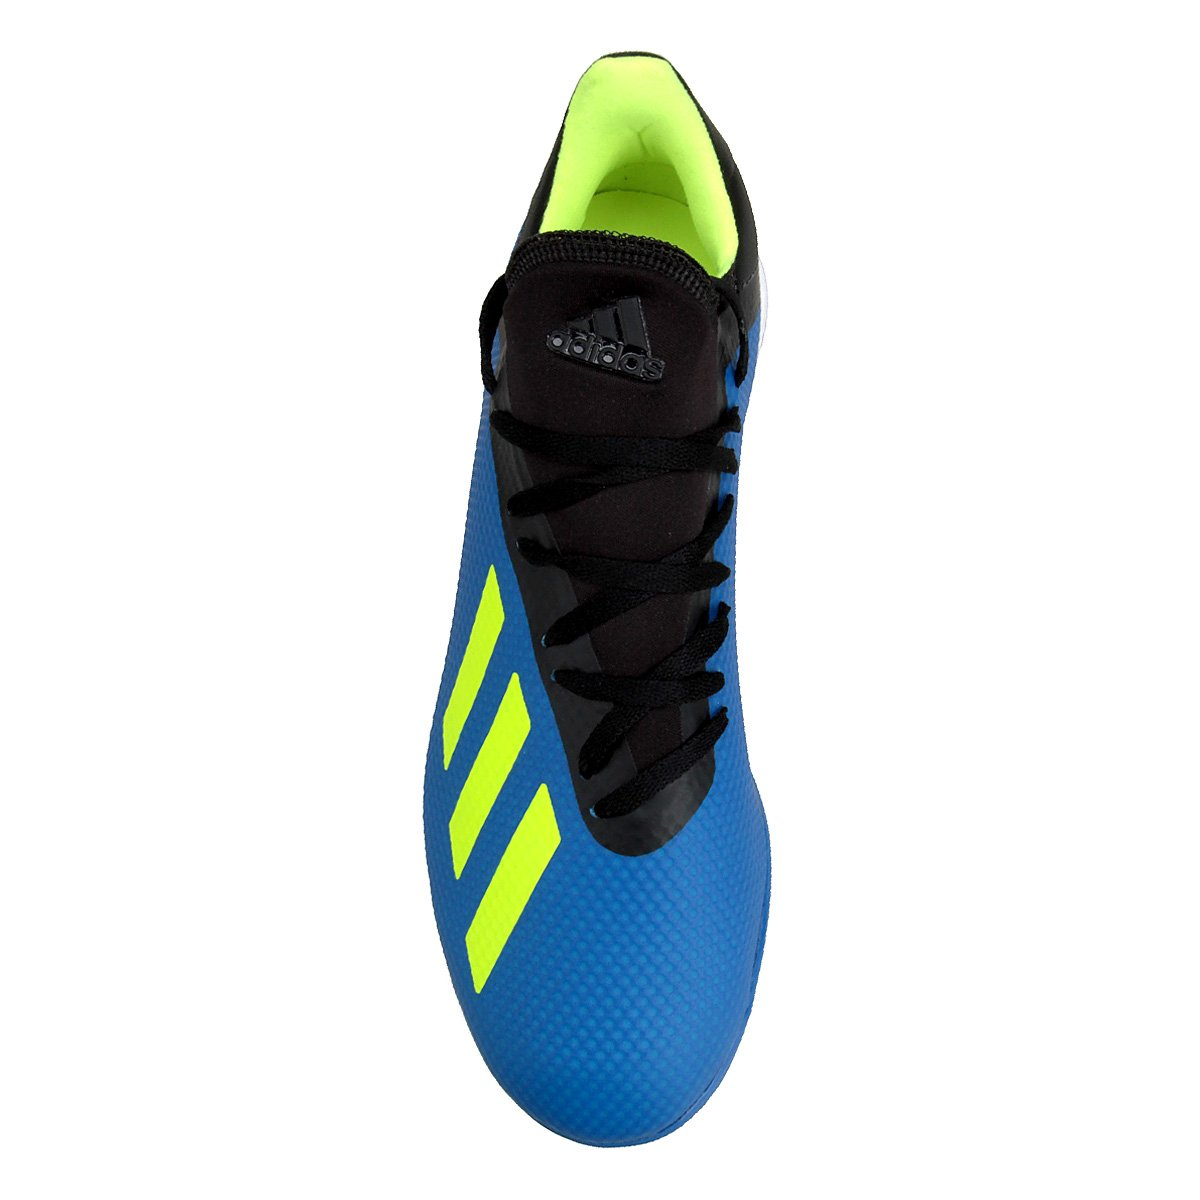 Chuteira Society Adidas X Tango 18 3 TF - Azul e Preto - Compre ... fb69f9b0de13b